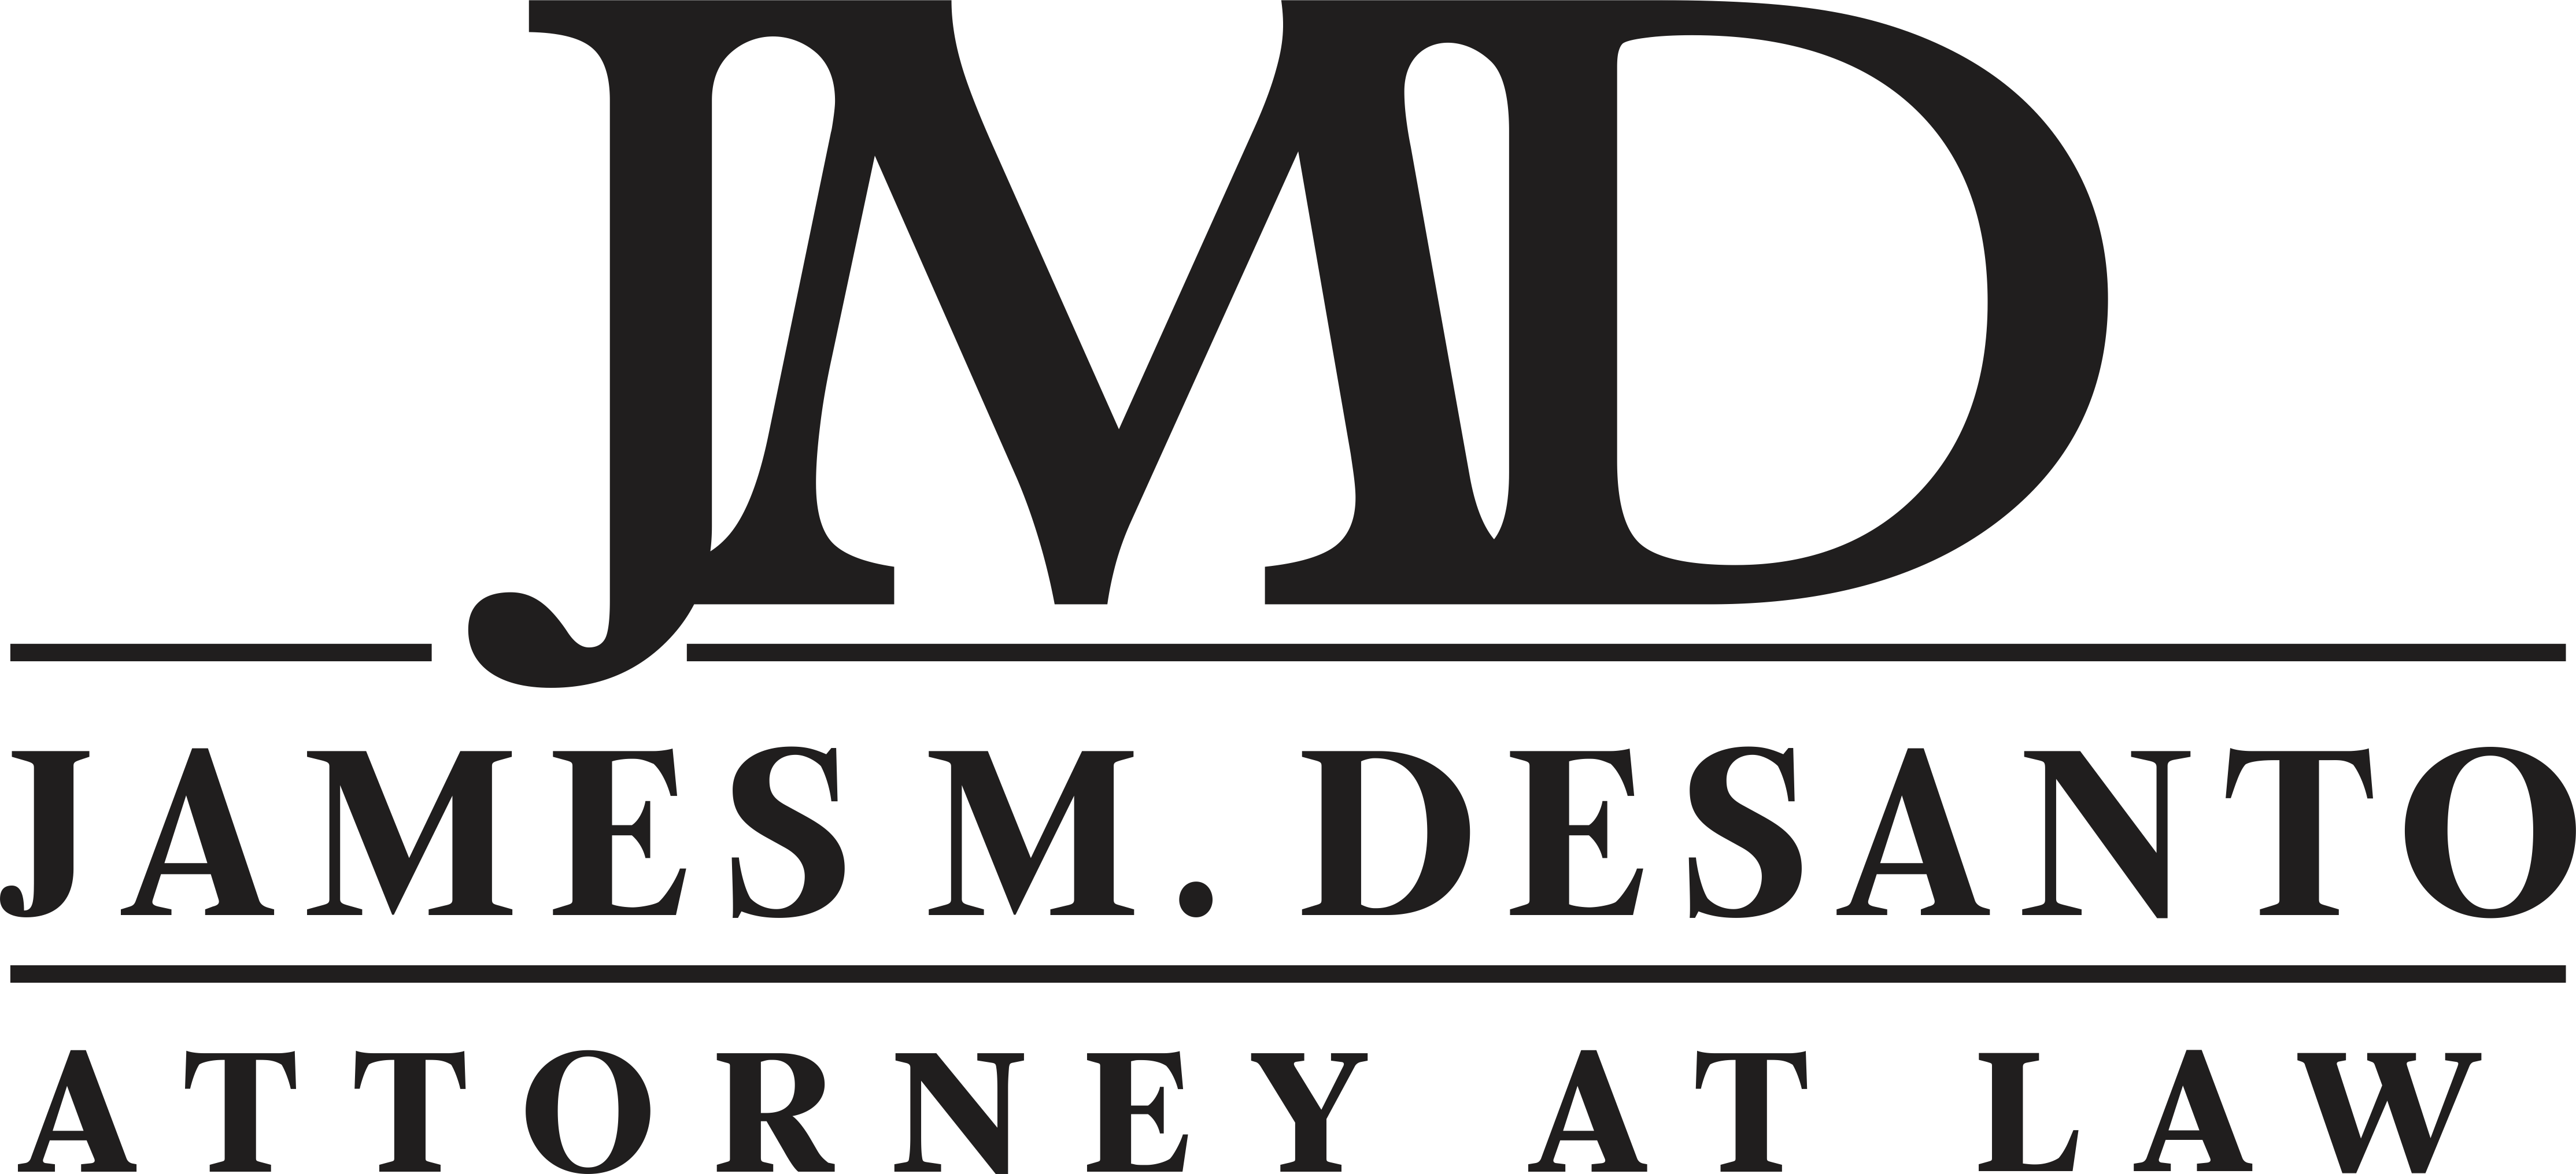 James M. DeSanto Attorny at Law